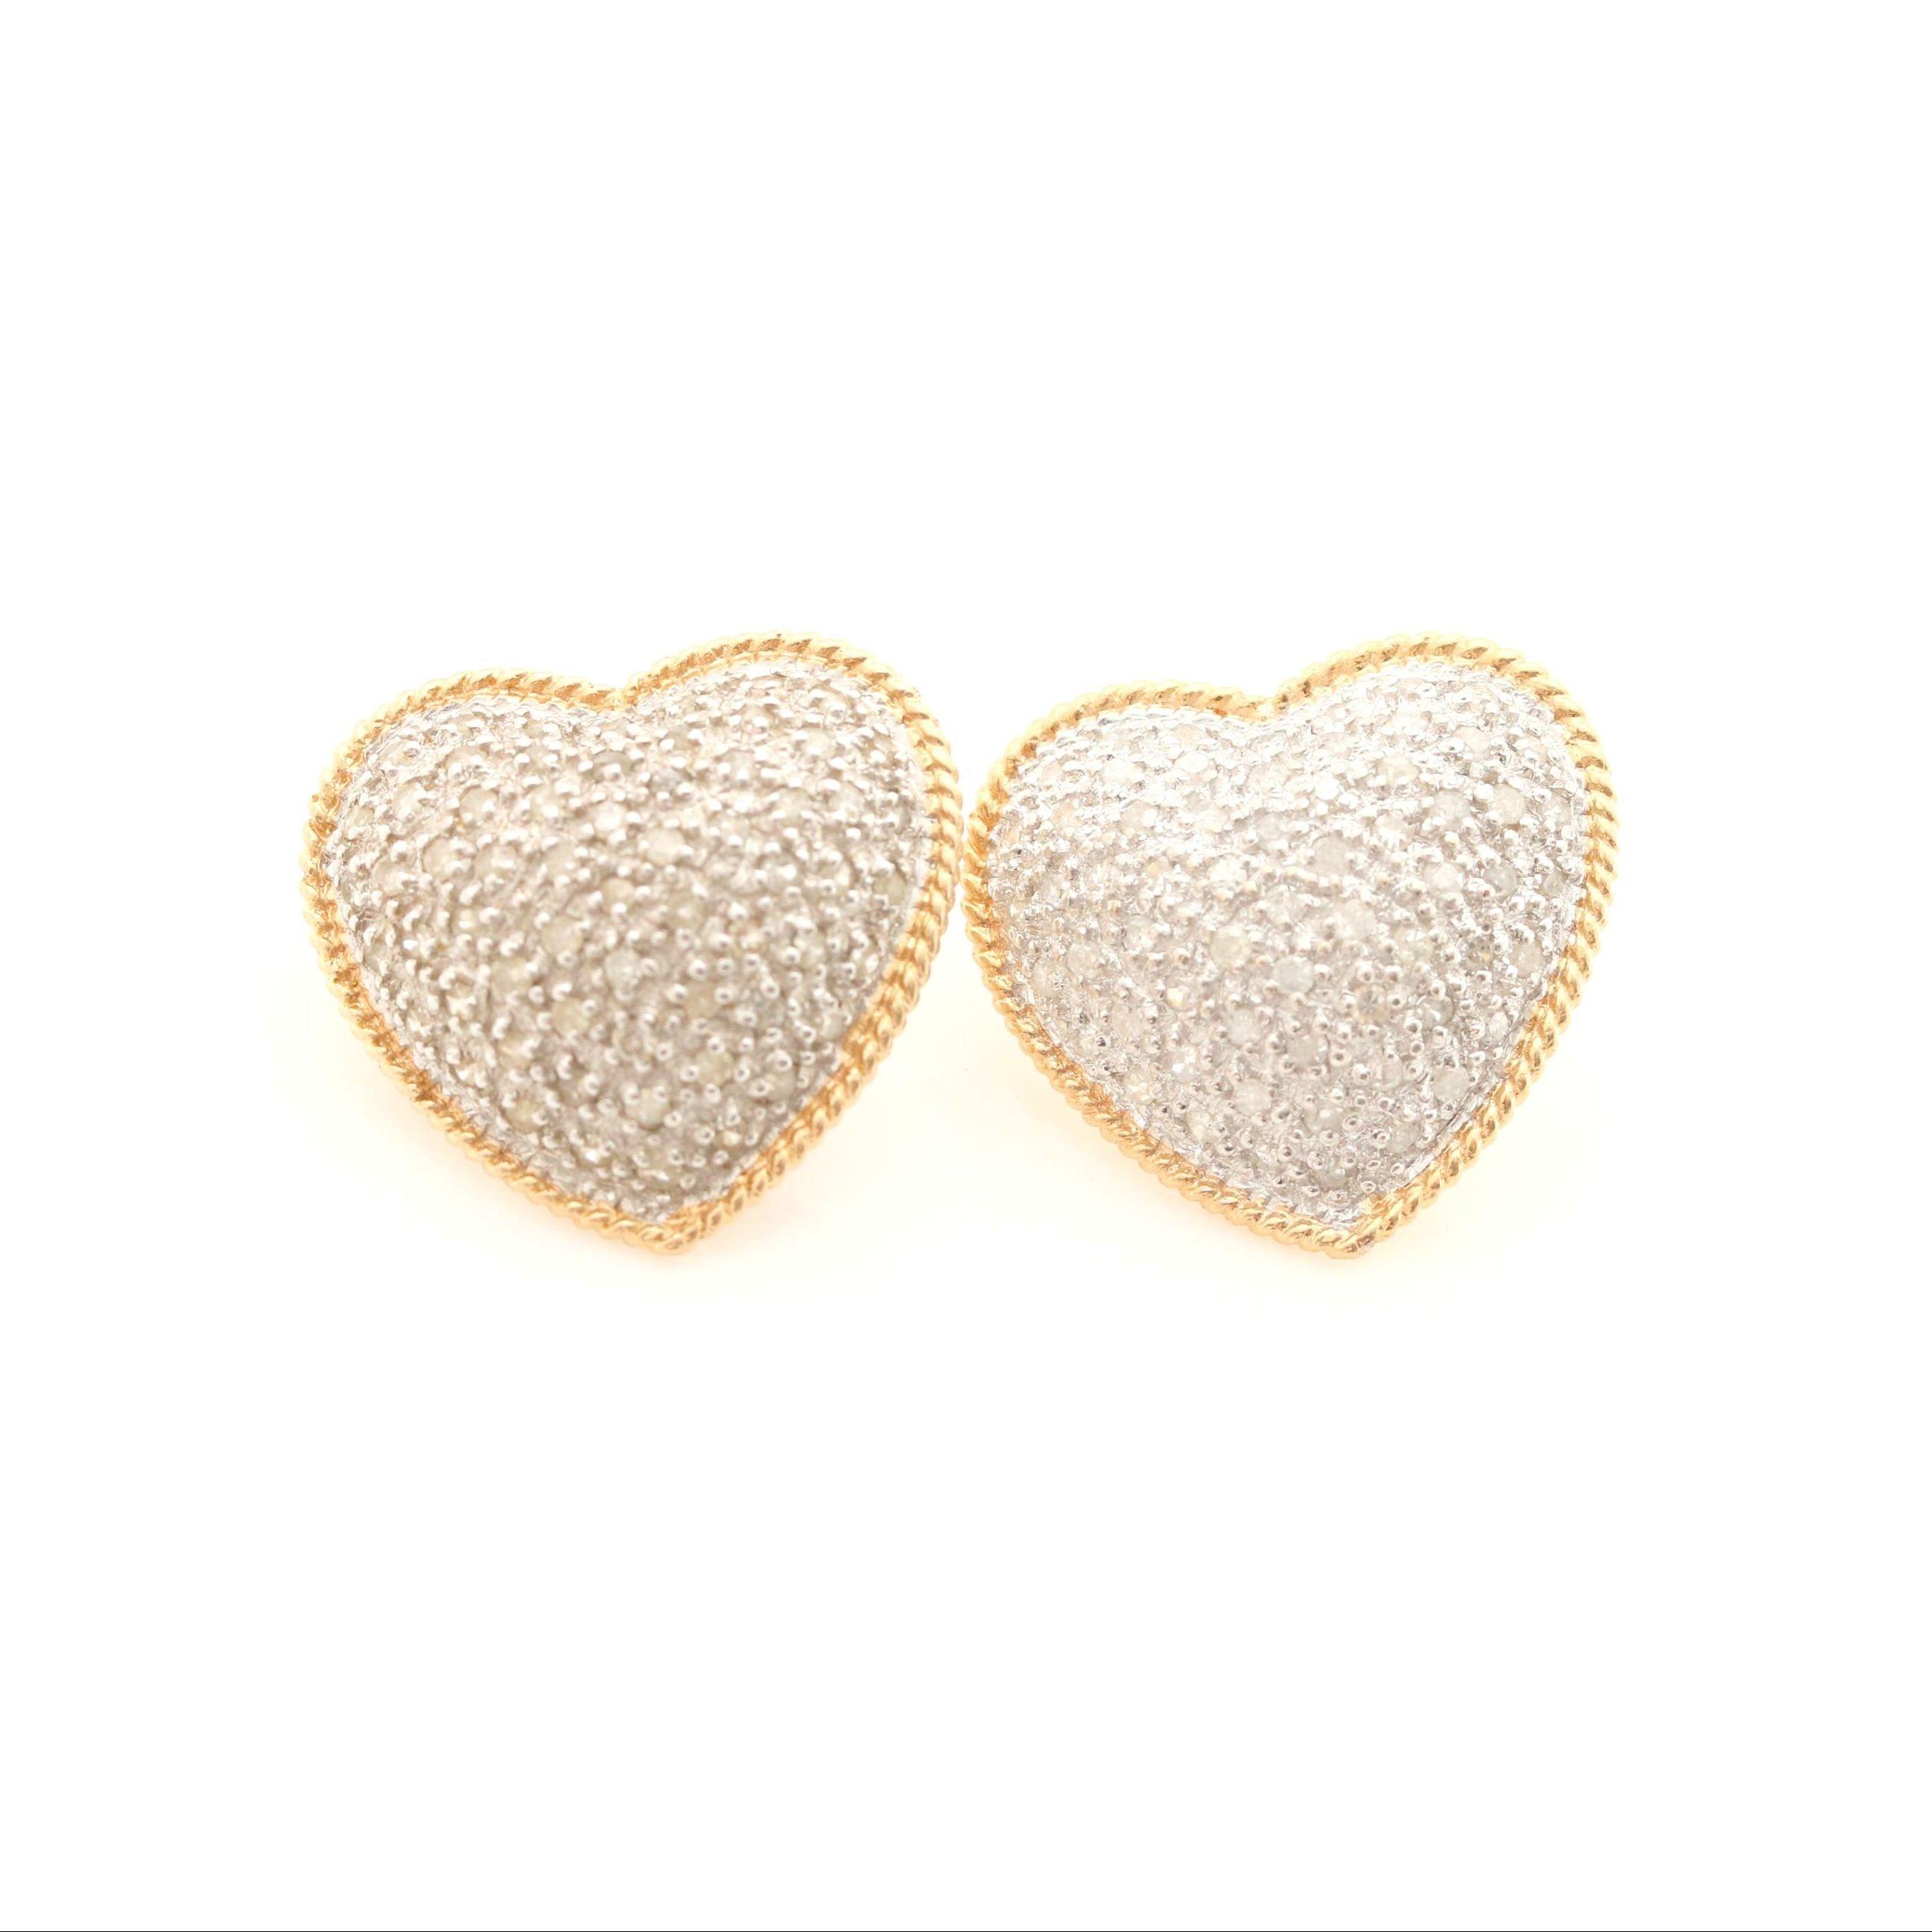 14K White and Yellow Gold Diamond Heart Earrings